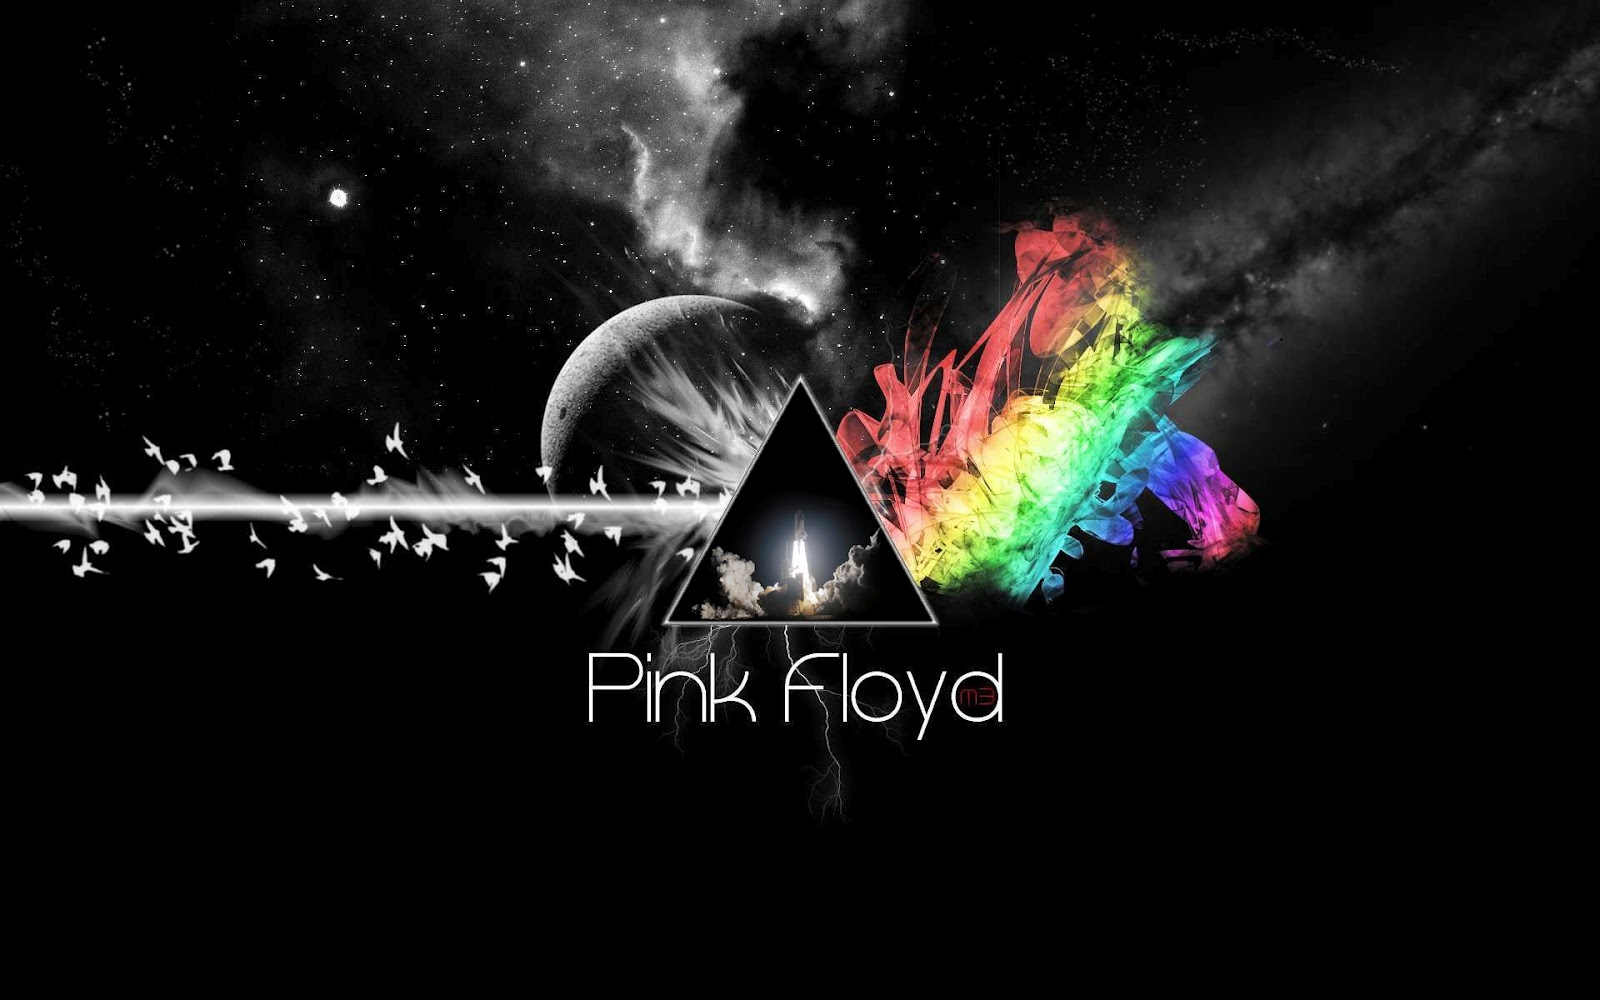 http://2.bp.blogspot.com/-rLugjjChTPg/T4icEgLYx1I/AAAAAAAAATE/3bmWUPsneZk/s1600/pink-floyd-wallpaper-4.jpg